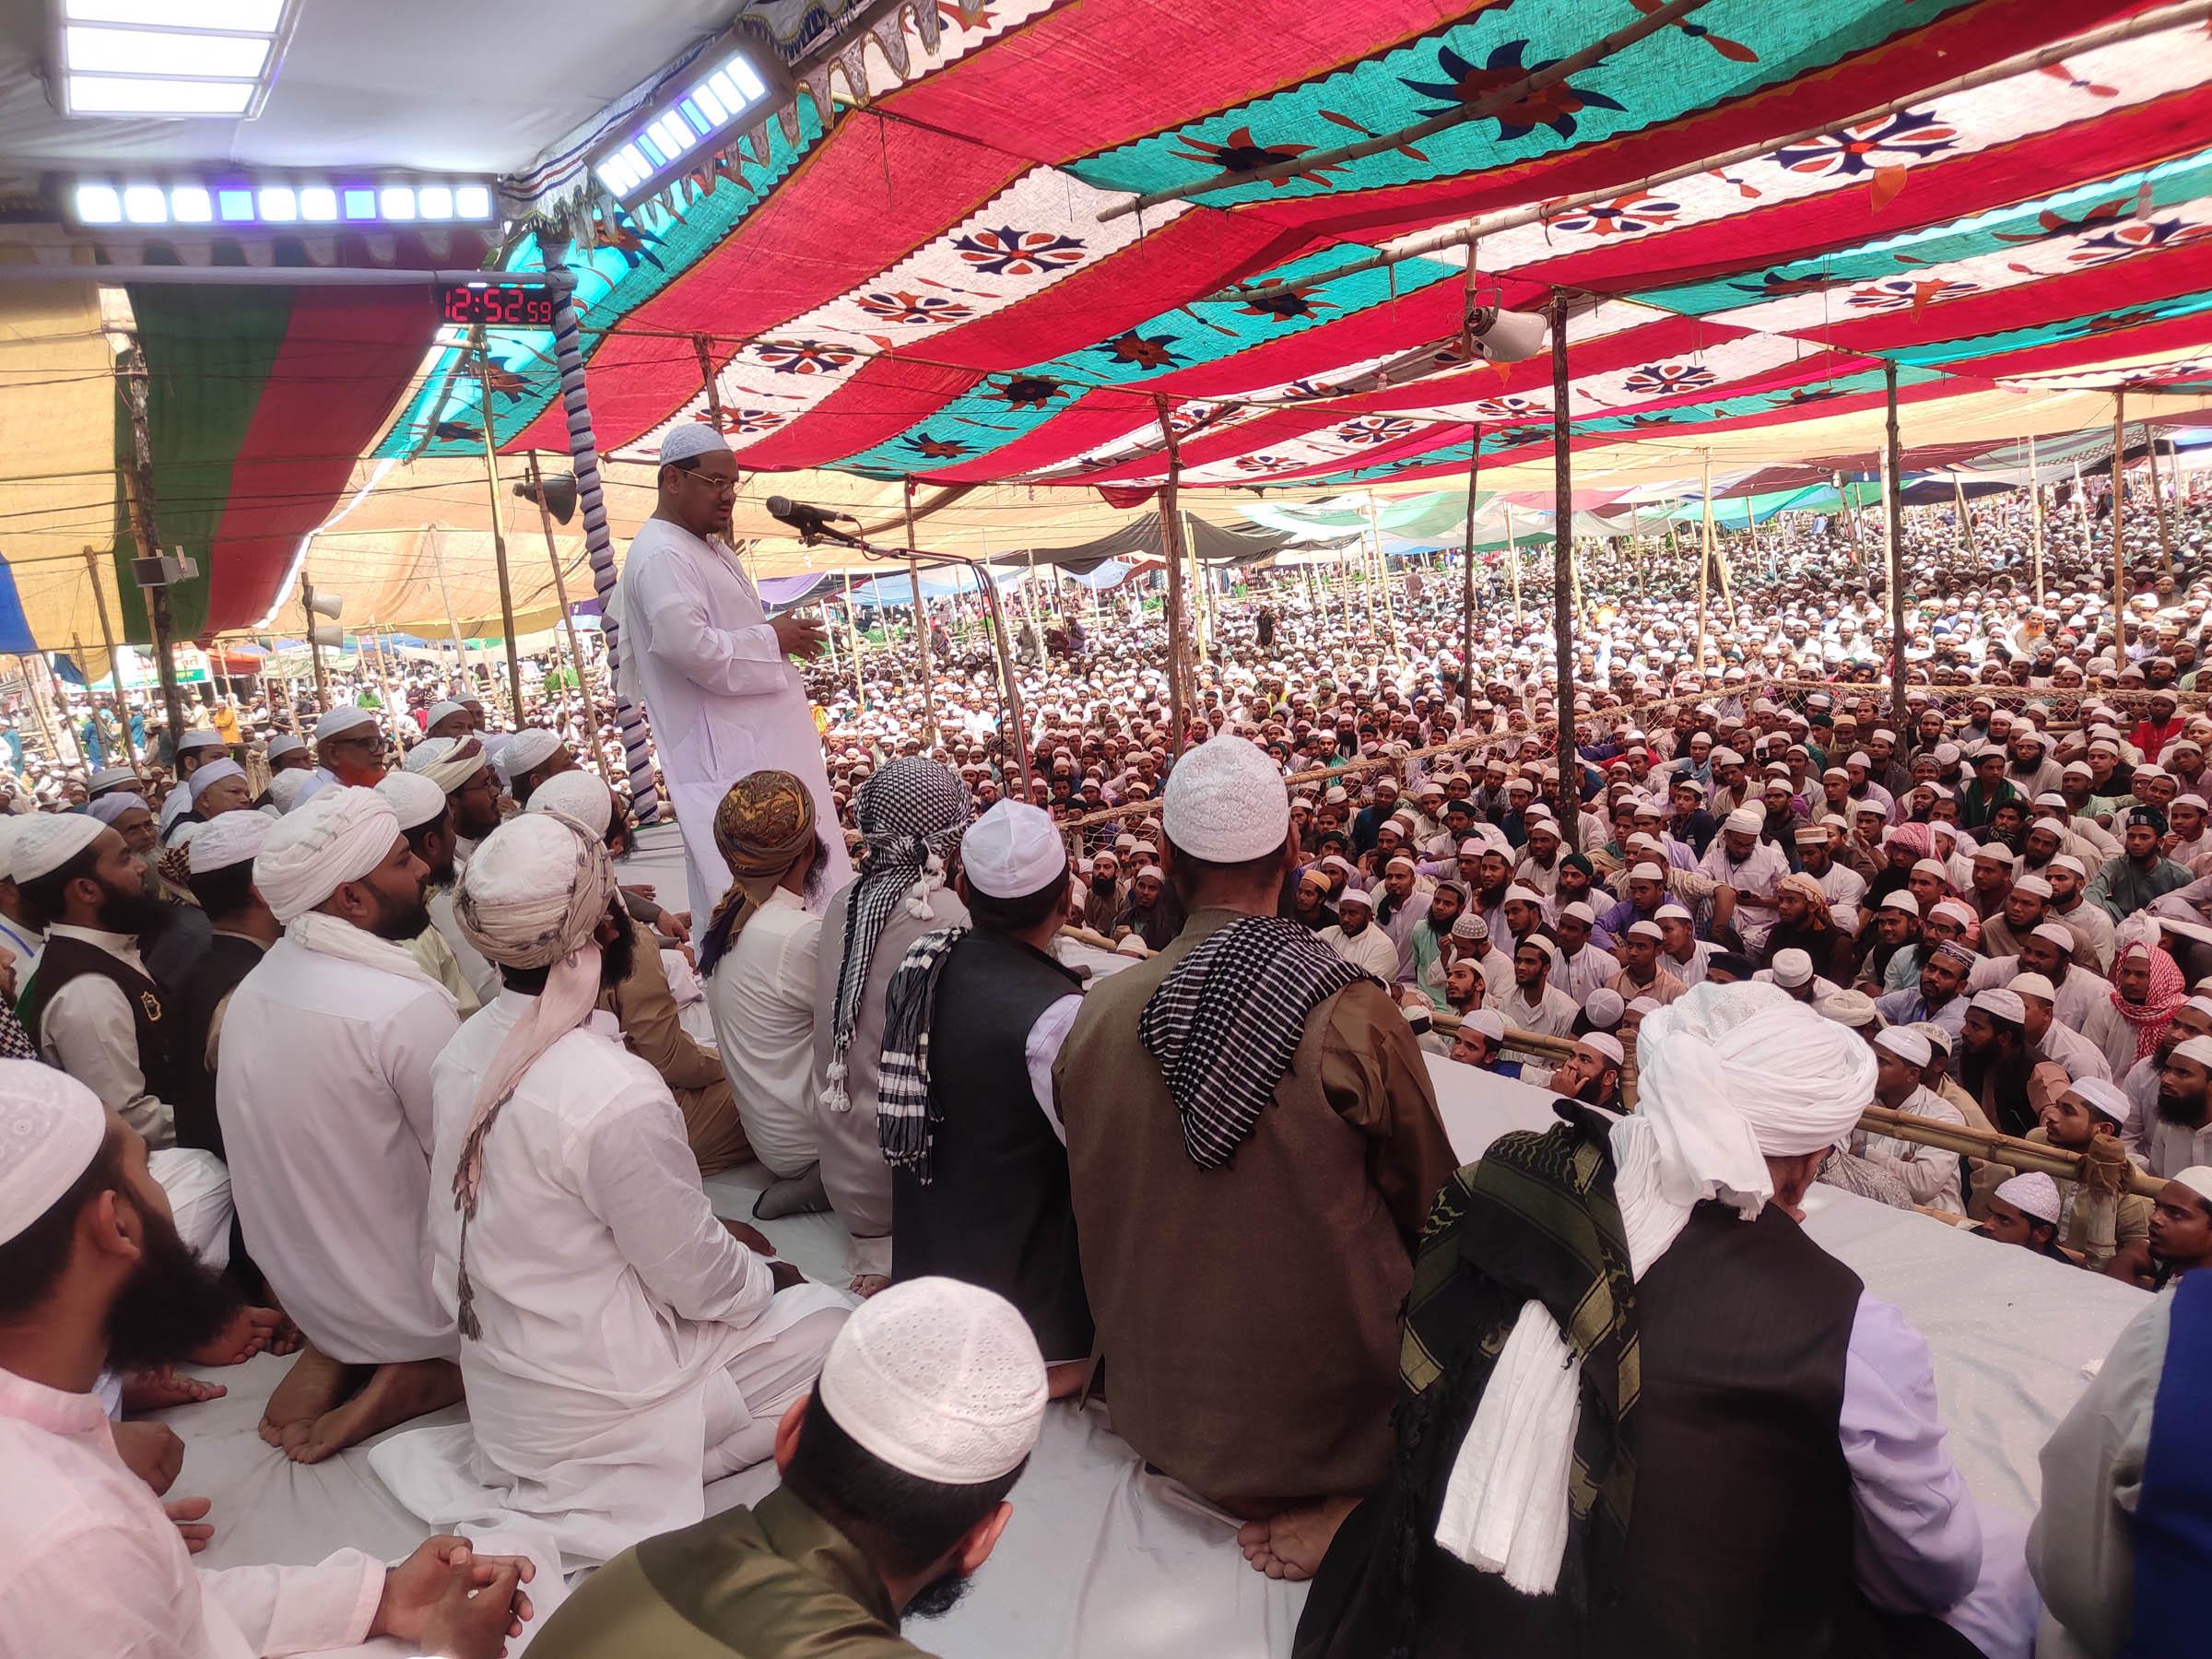 Photo of ইউপি নির্বাচনে ইসলামকে বিজয়ী করতে হবে : পীর সাহেব চরমোনাই